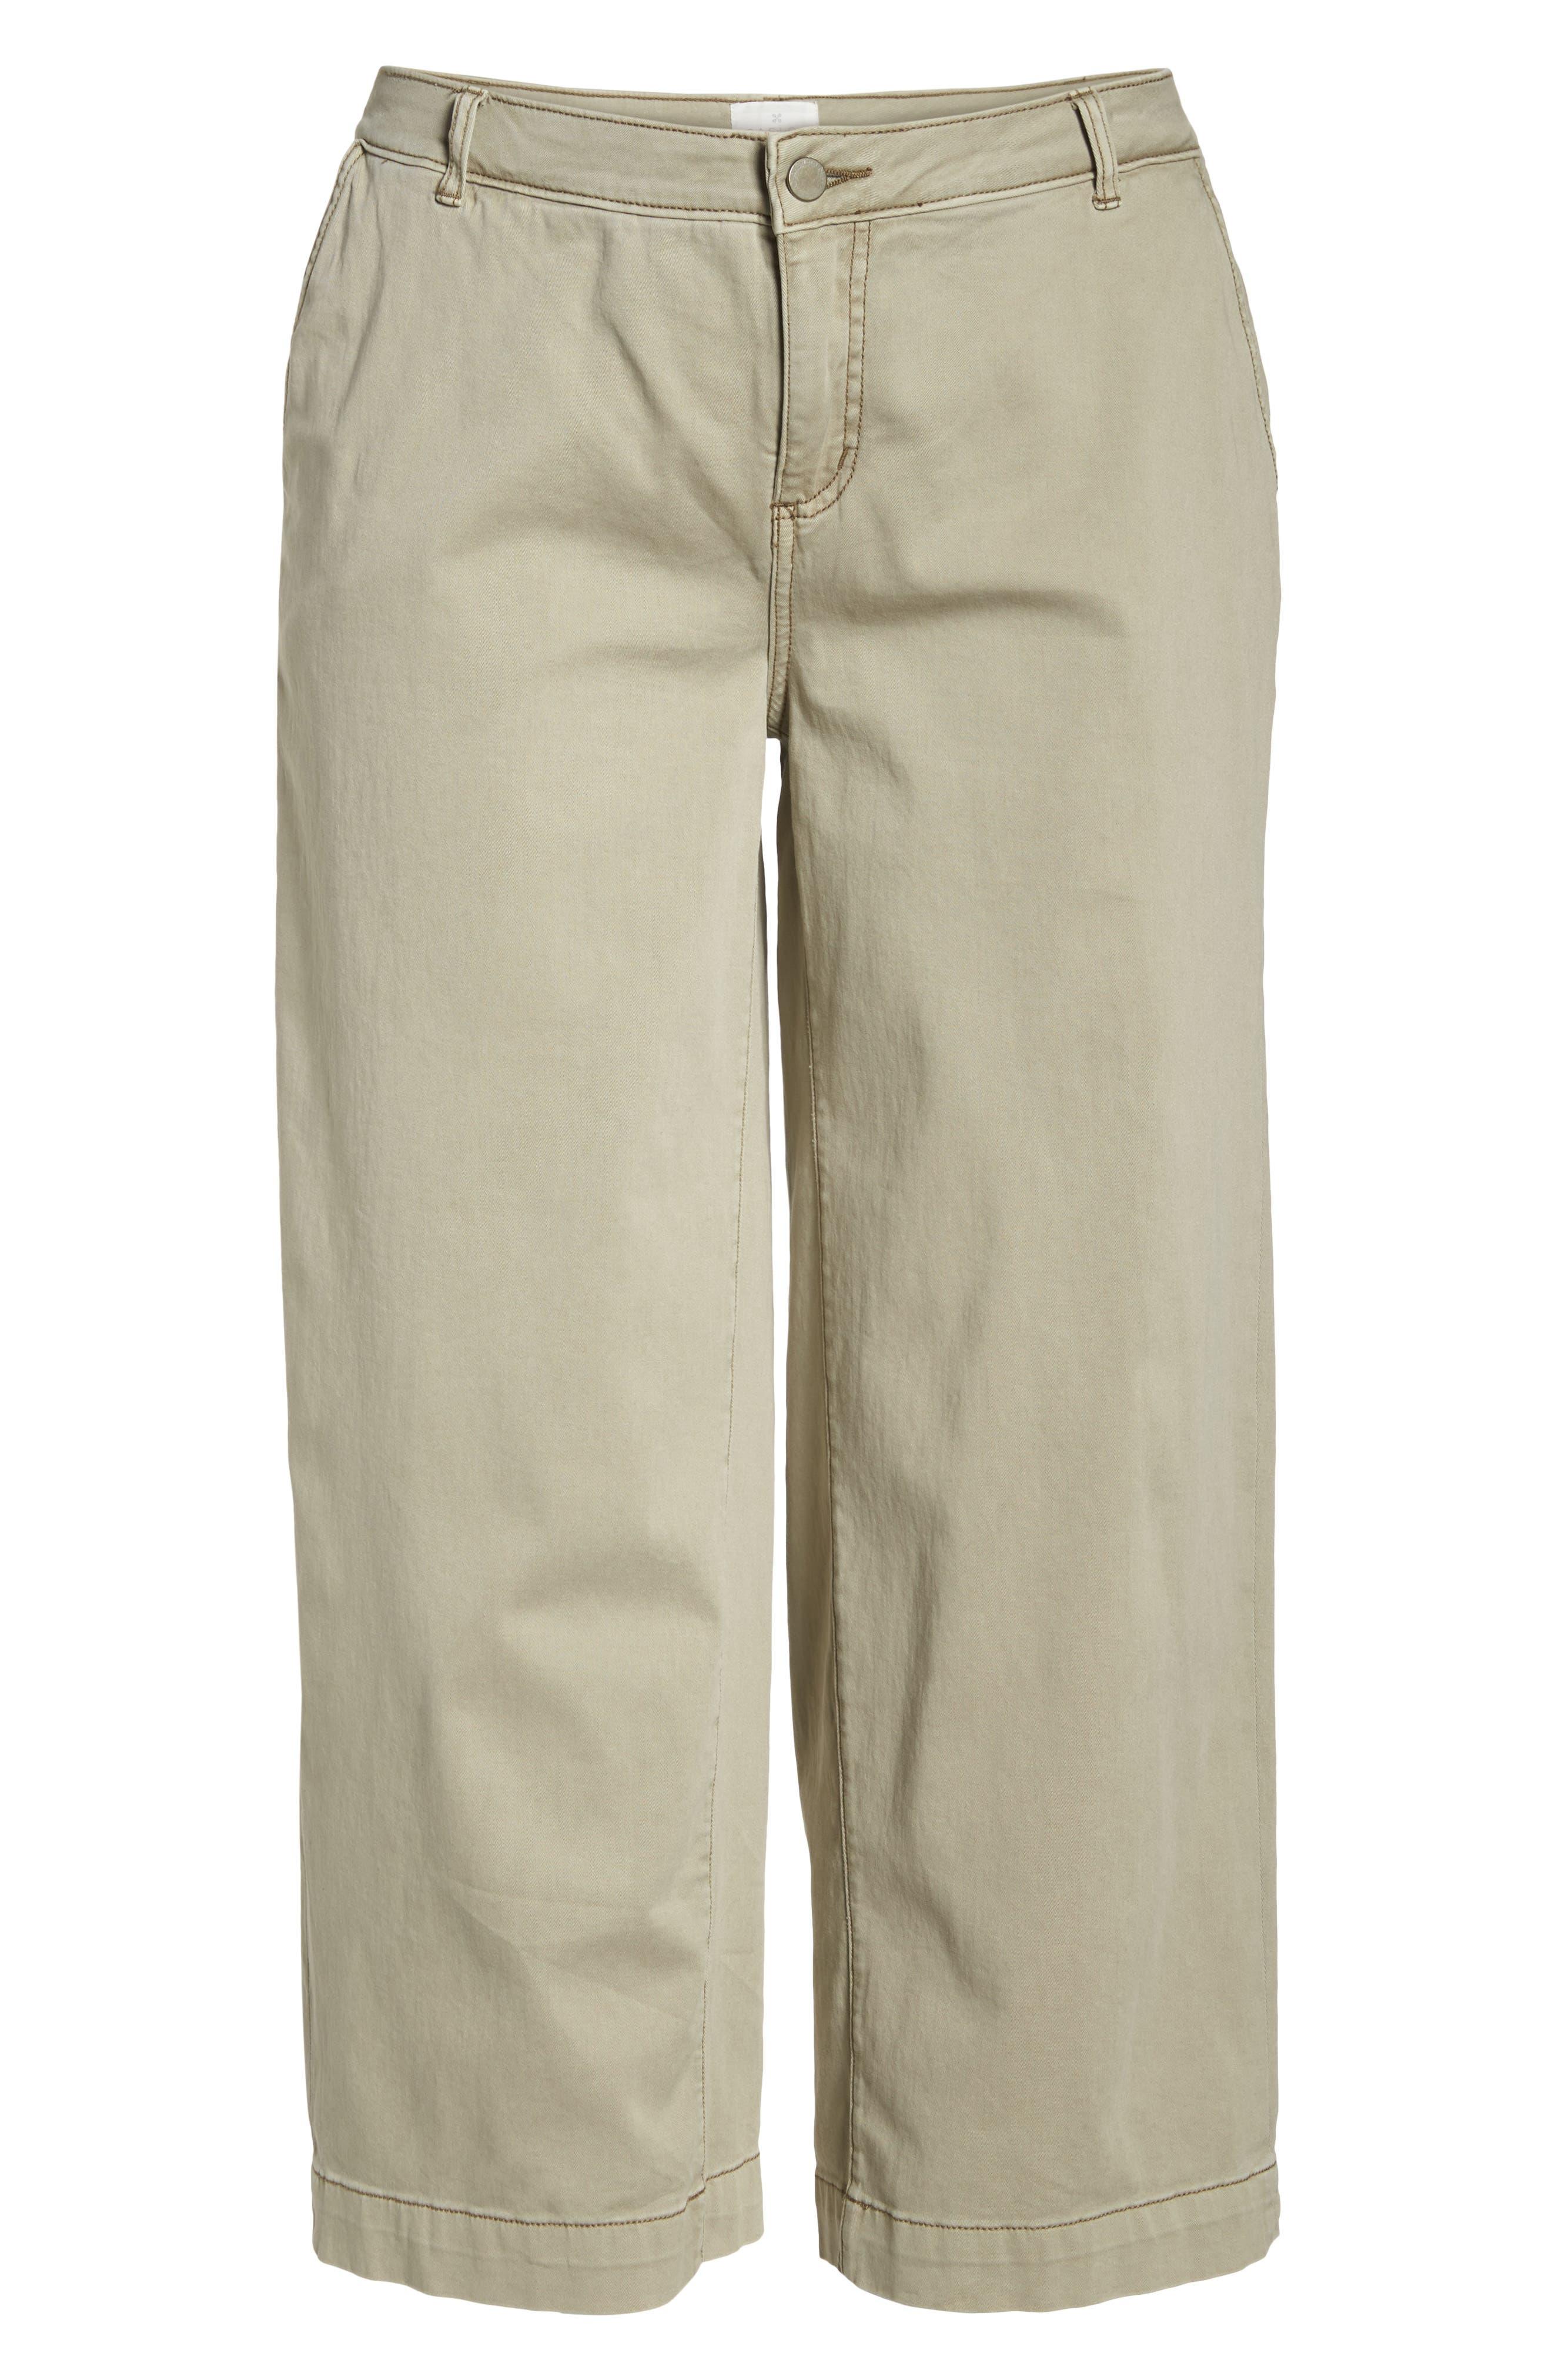 Wide Leg Stretch Cotton Twill Crop Pants,                             Alternate thumbnail 7, color,                             Tan Cobblestone